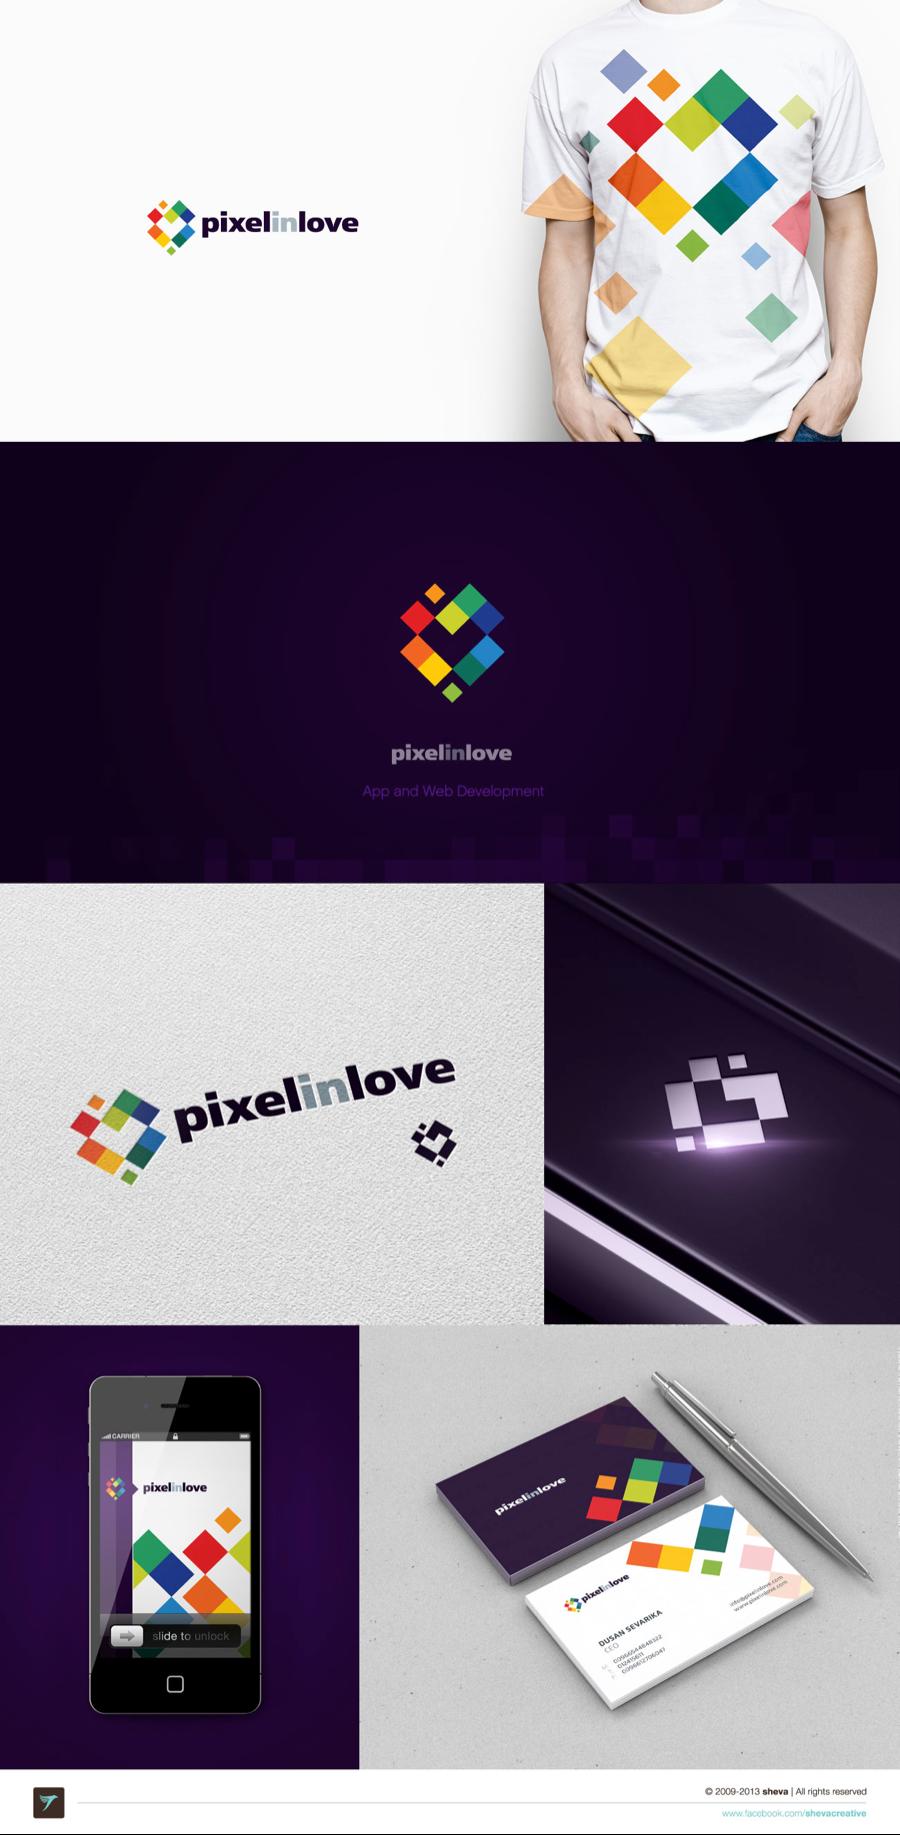 pixelinlove